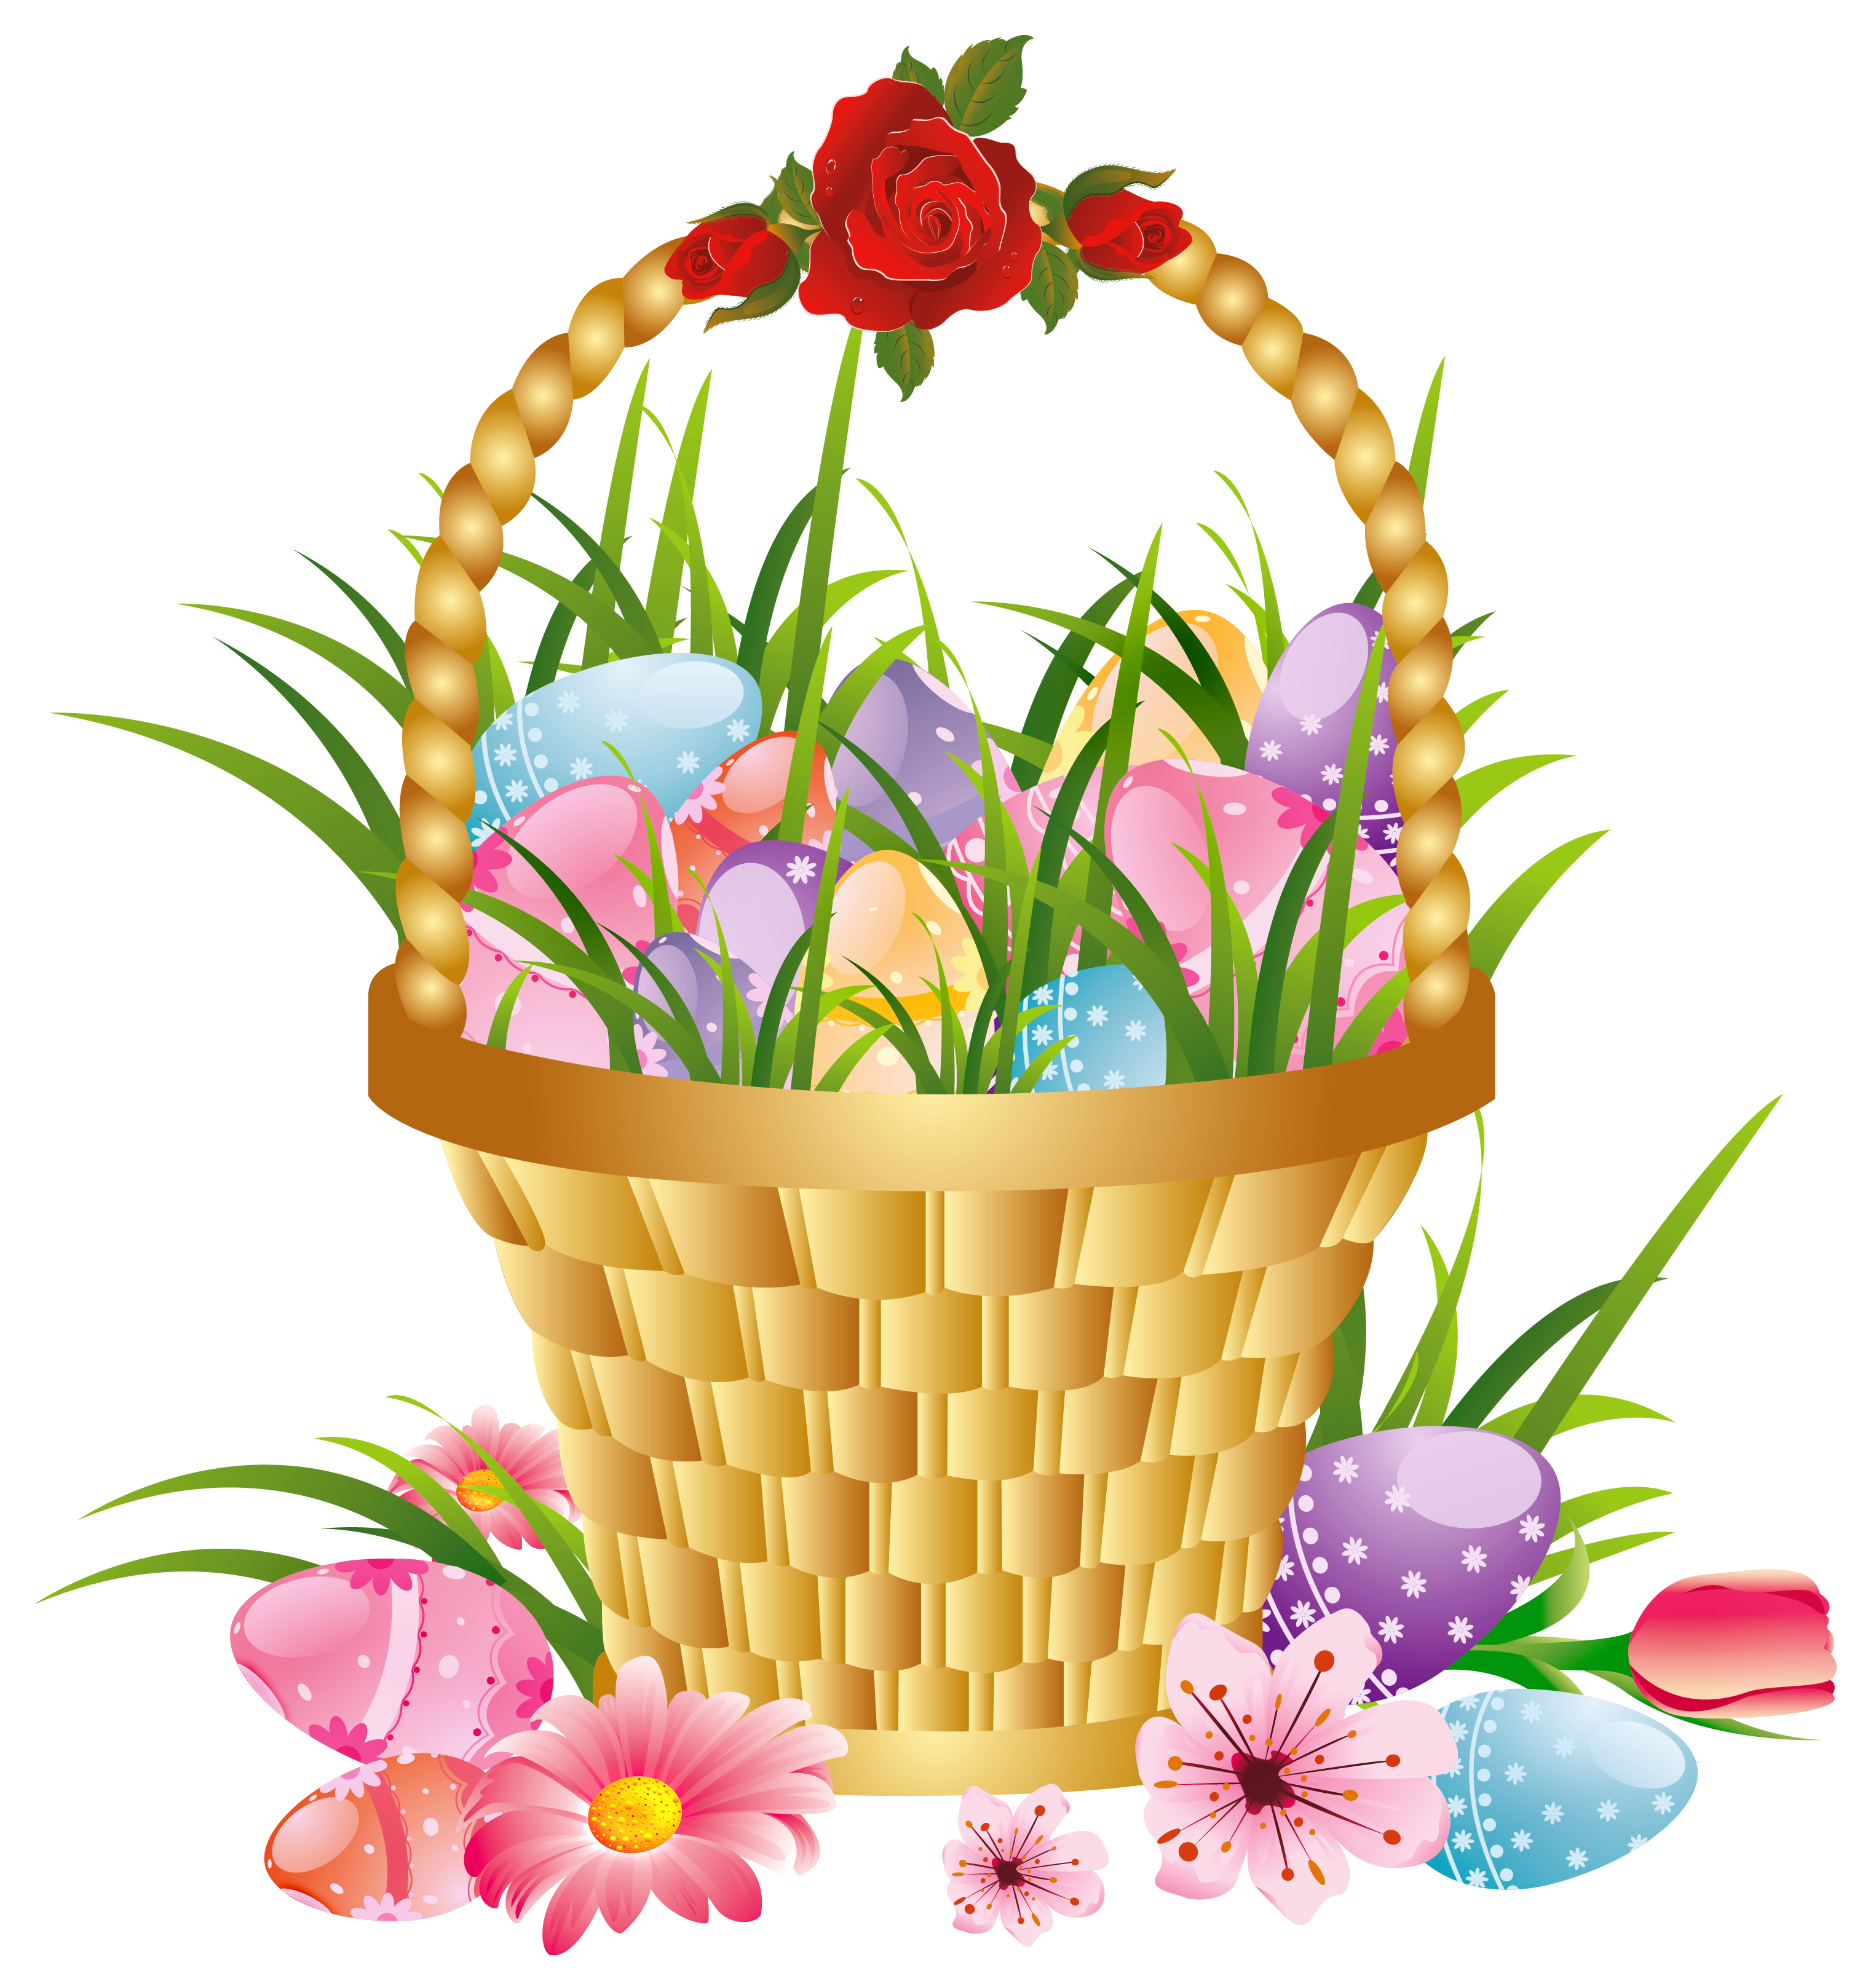 Download easter basket bunny png hd hq png image freepngimg easter basket bunny png hd png image free download png negle Image collections